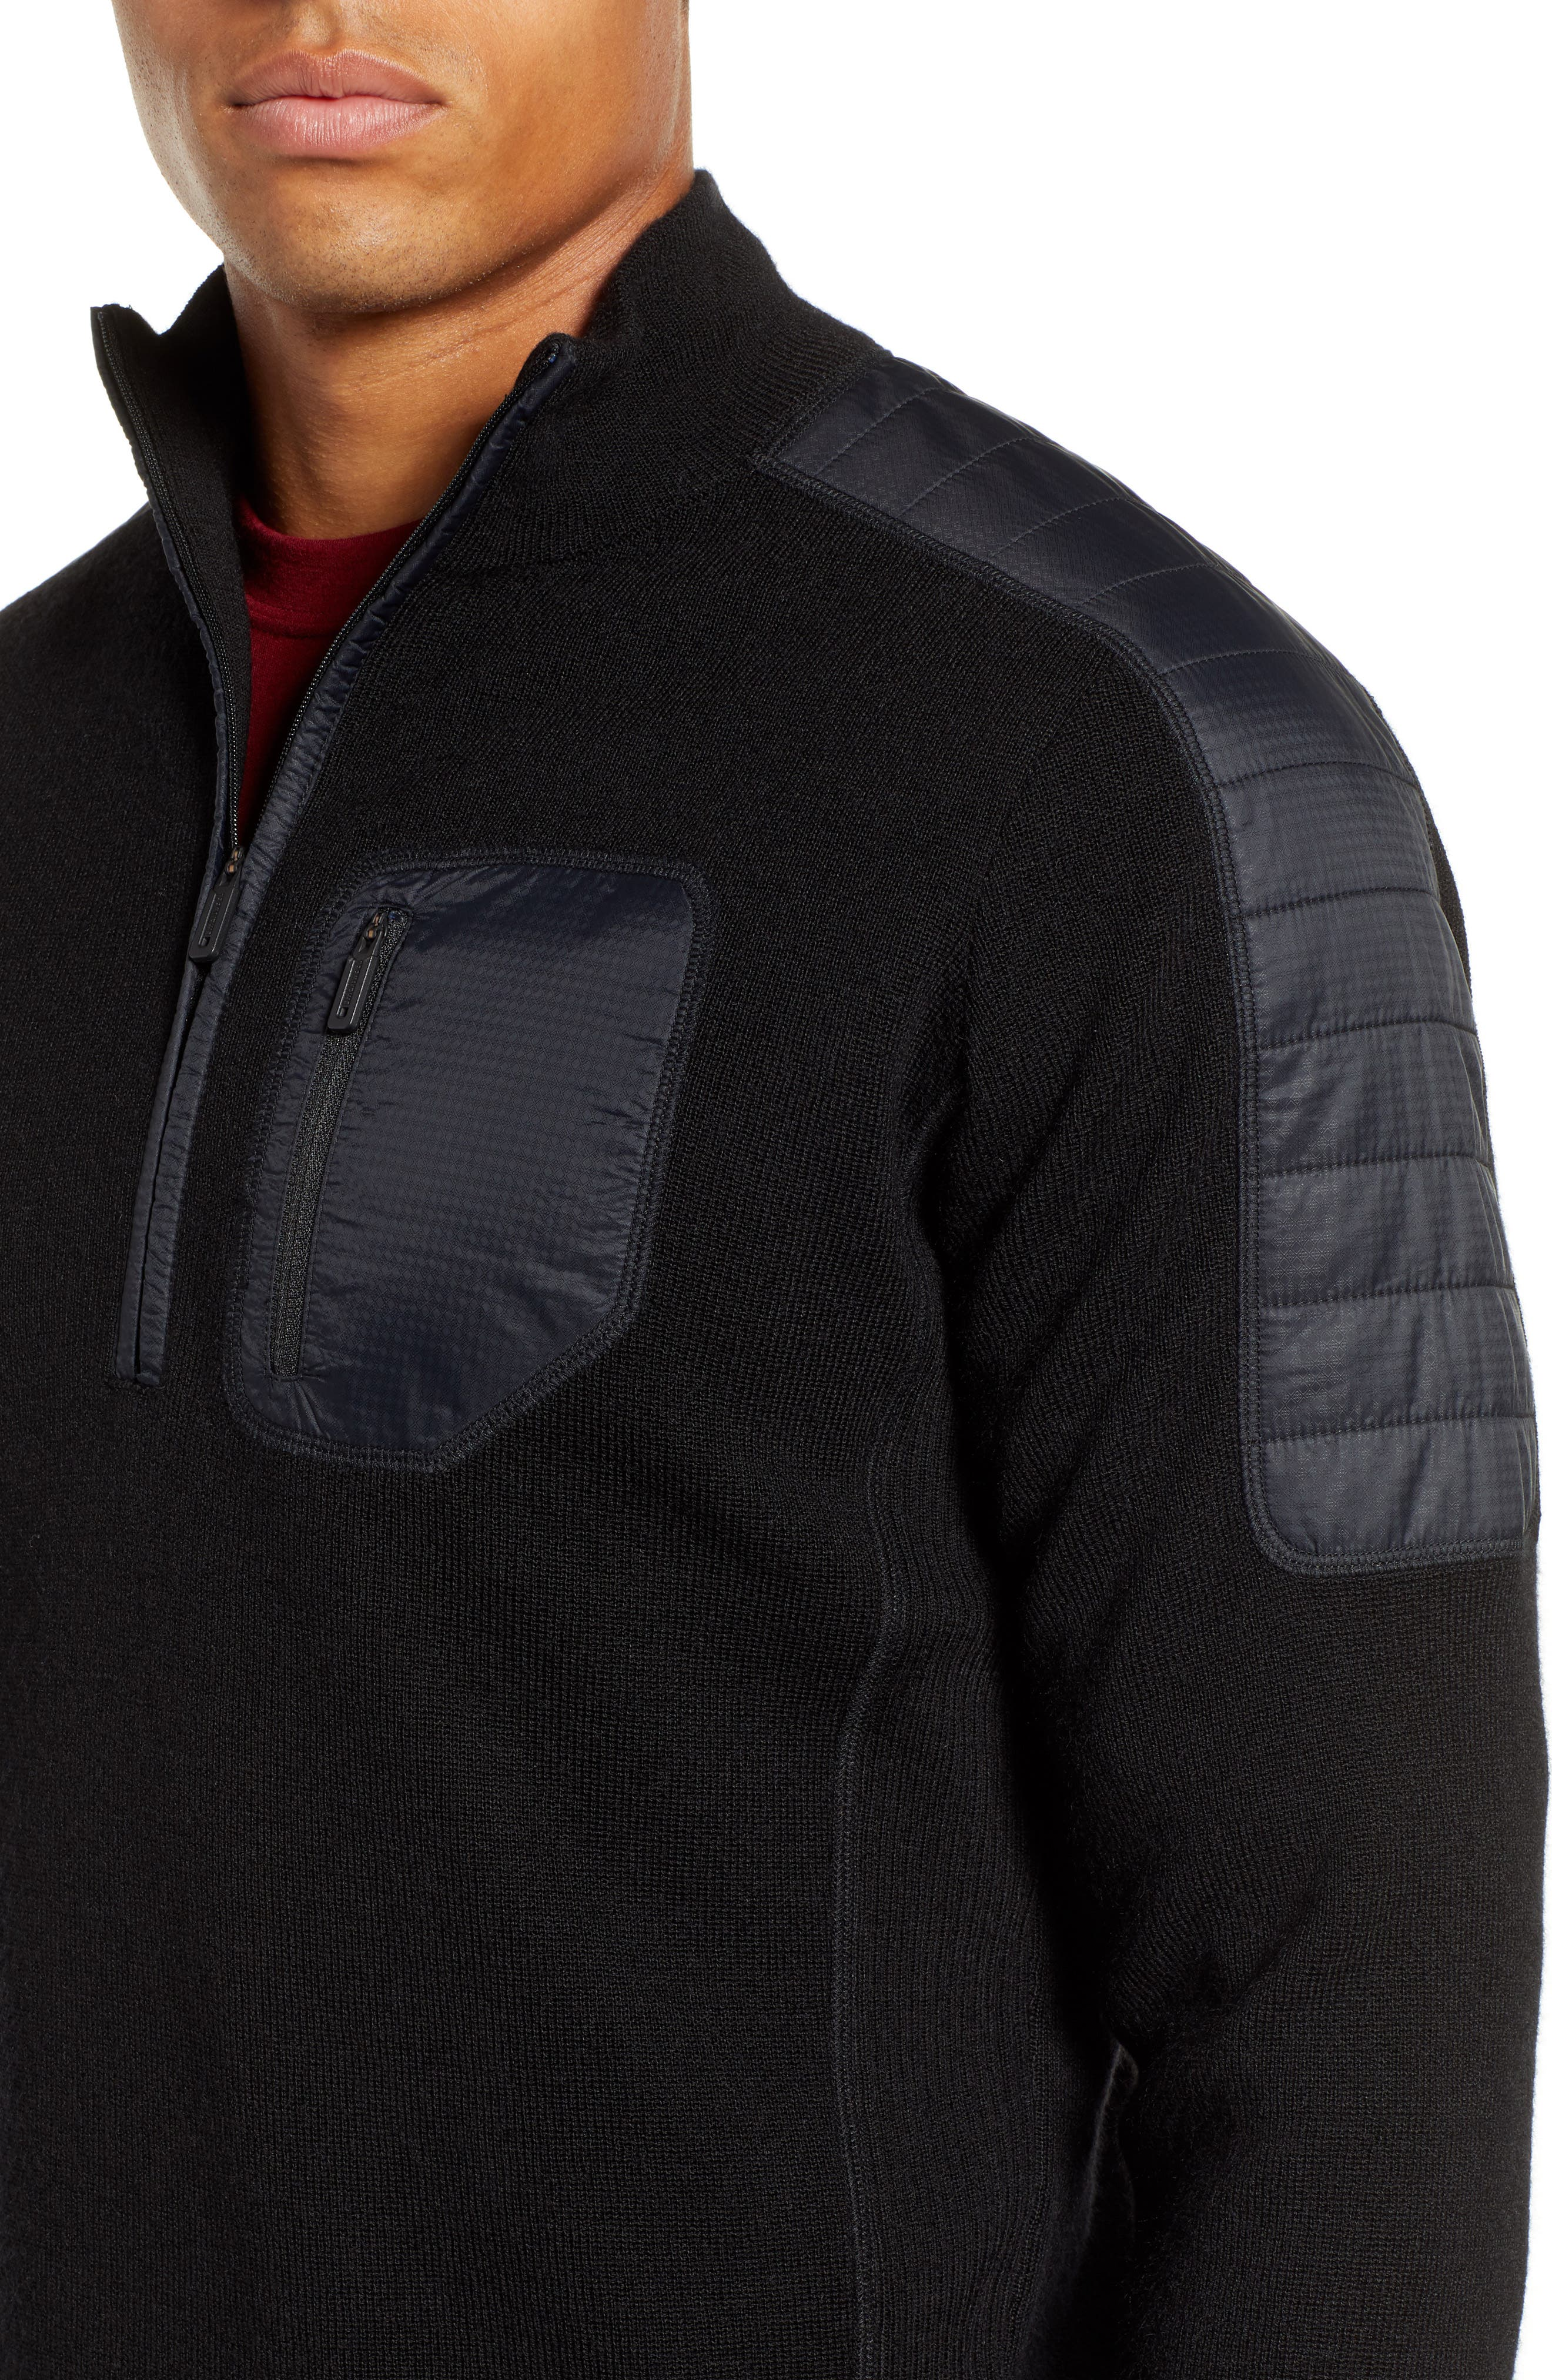 SMARTWOOL,                             Ski Ninja Pullover Sweater,                             Alternate thumbnail 4, color,                             BLACK